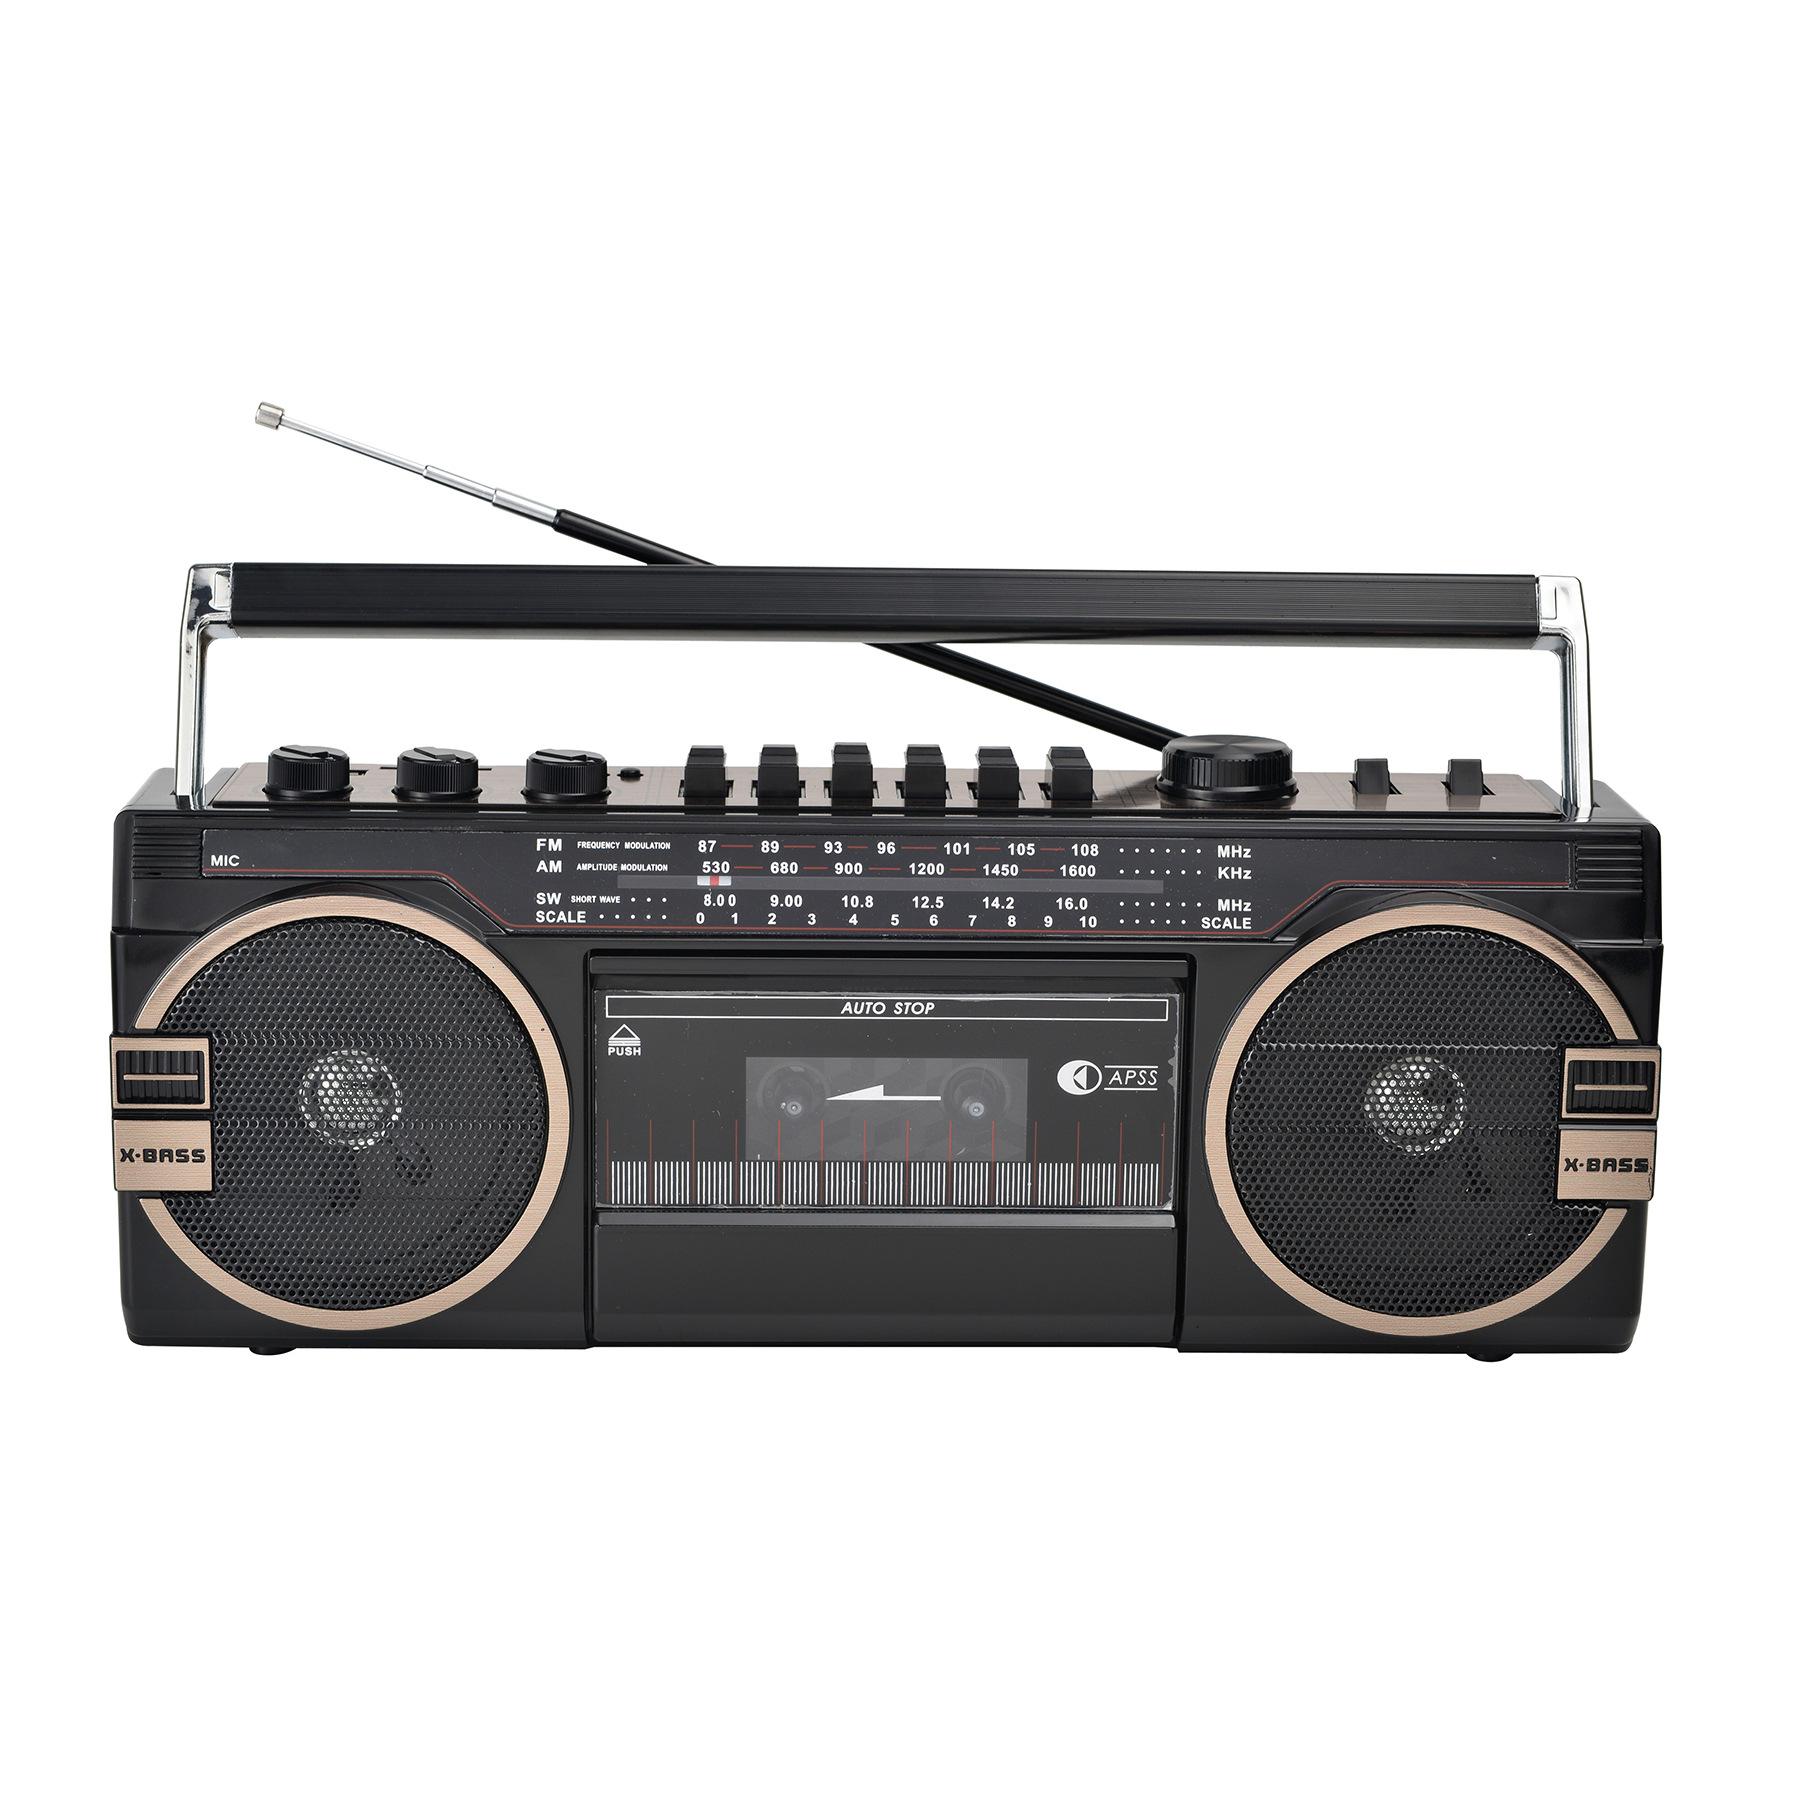 Cmik tape recorder old-fashioned 80s nostalgic retro portable radio cassette player tape recorder